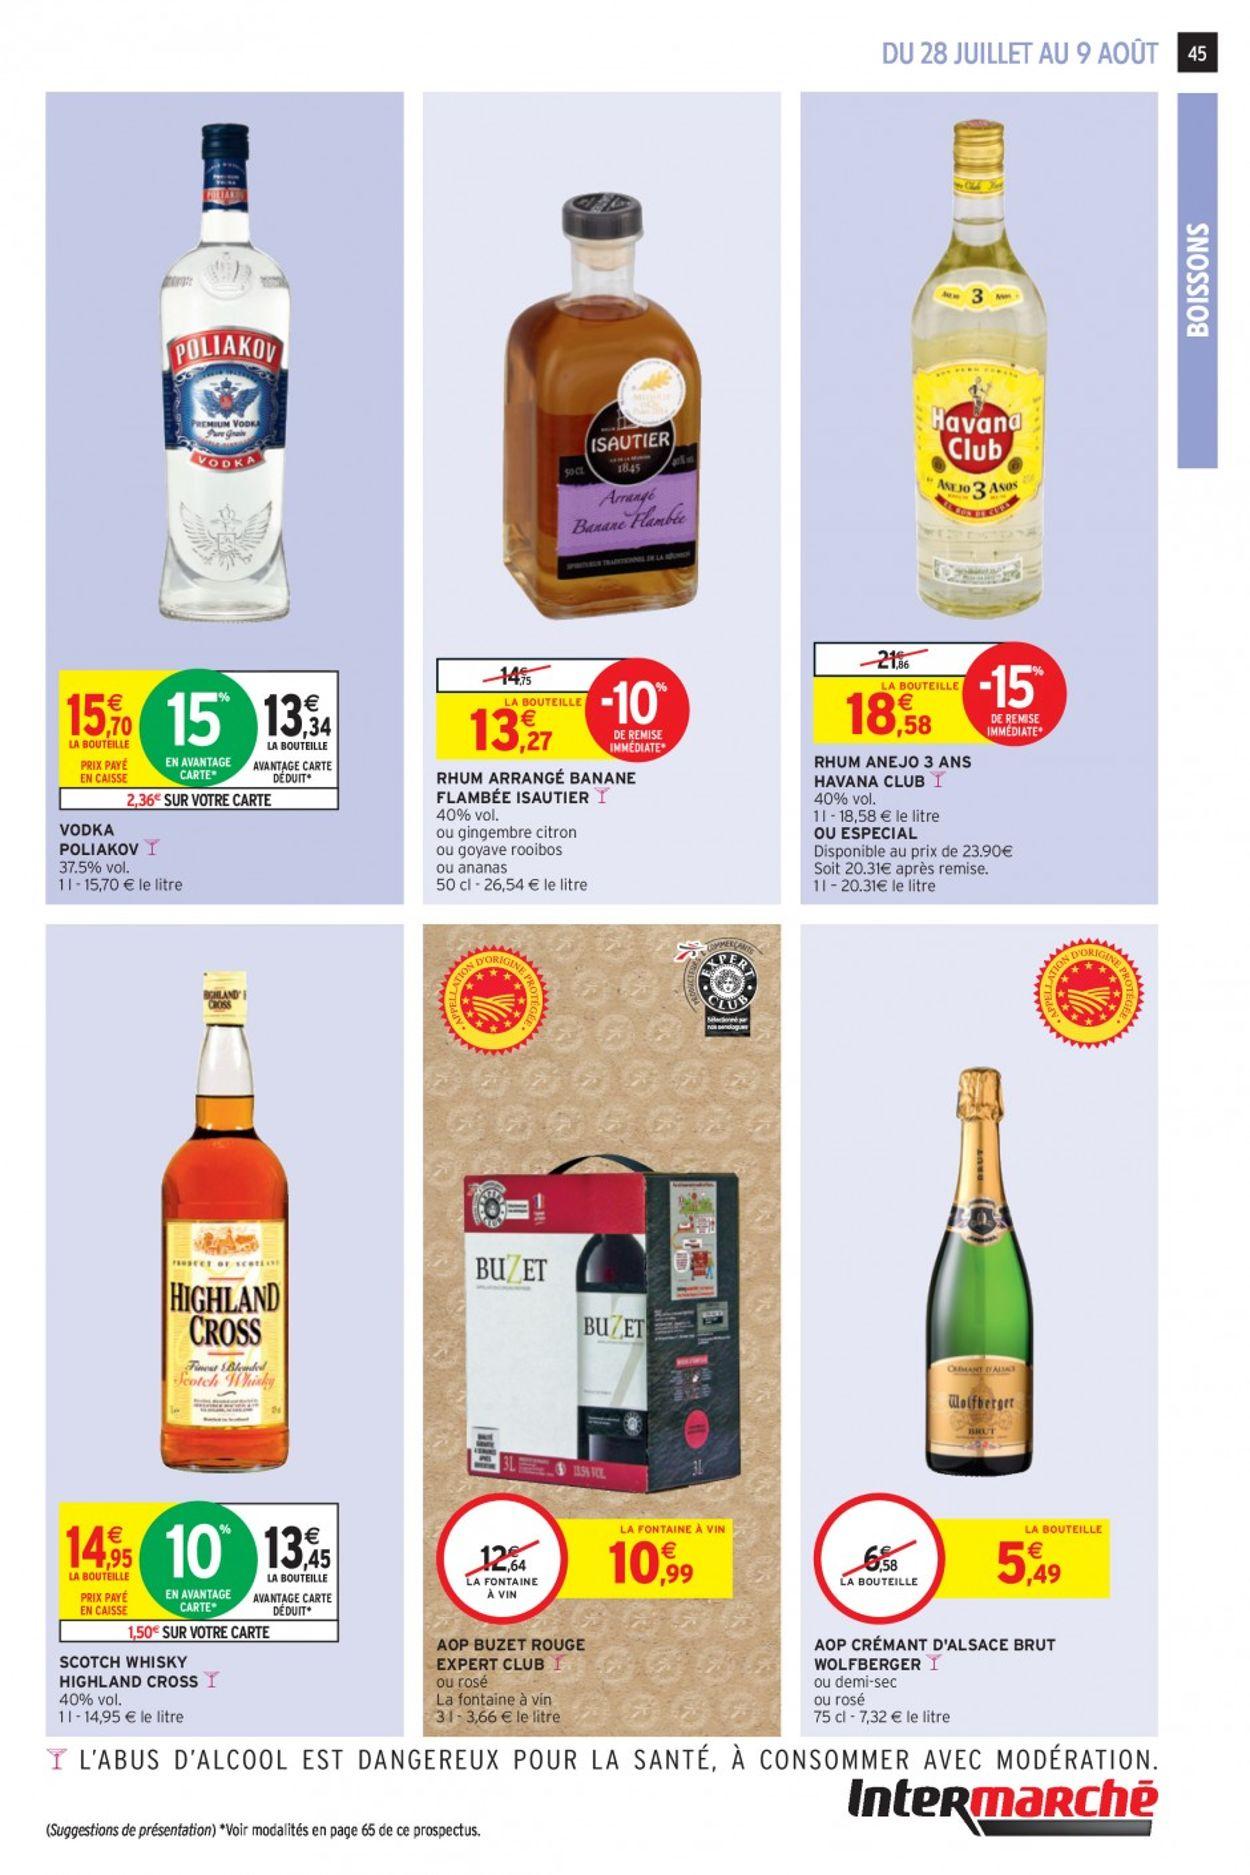 Intermarché Catalogue - 28.07-09.08.2020 (Page 45)